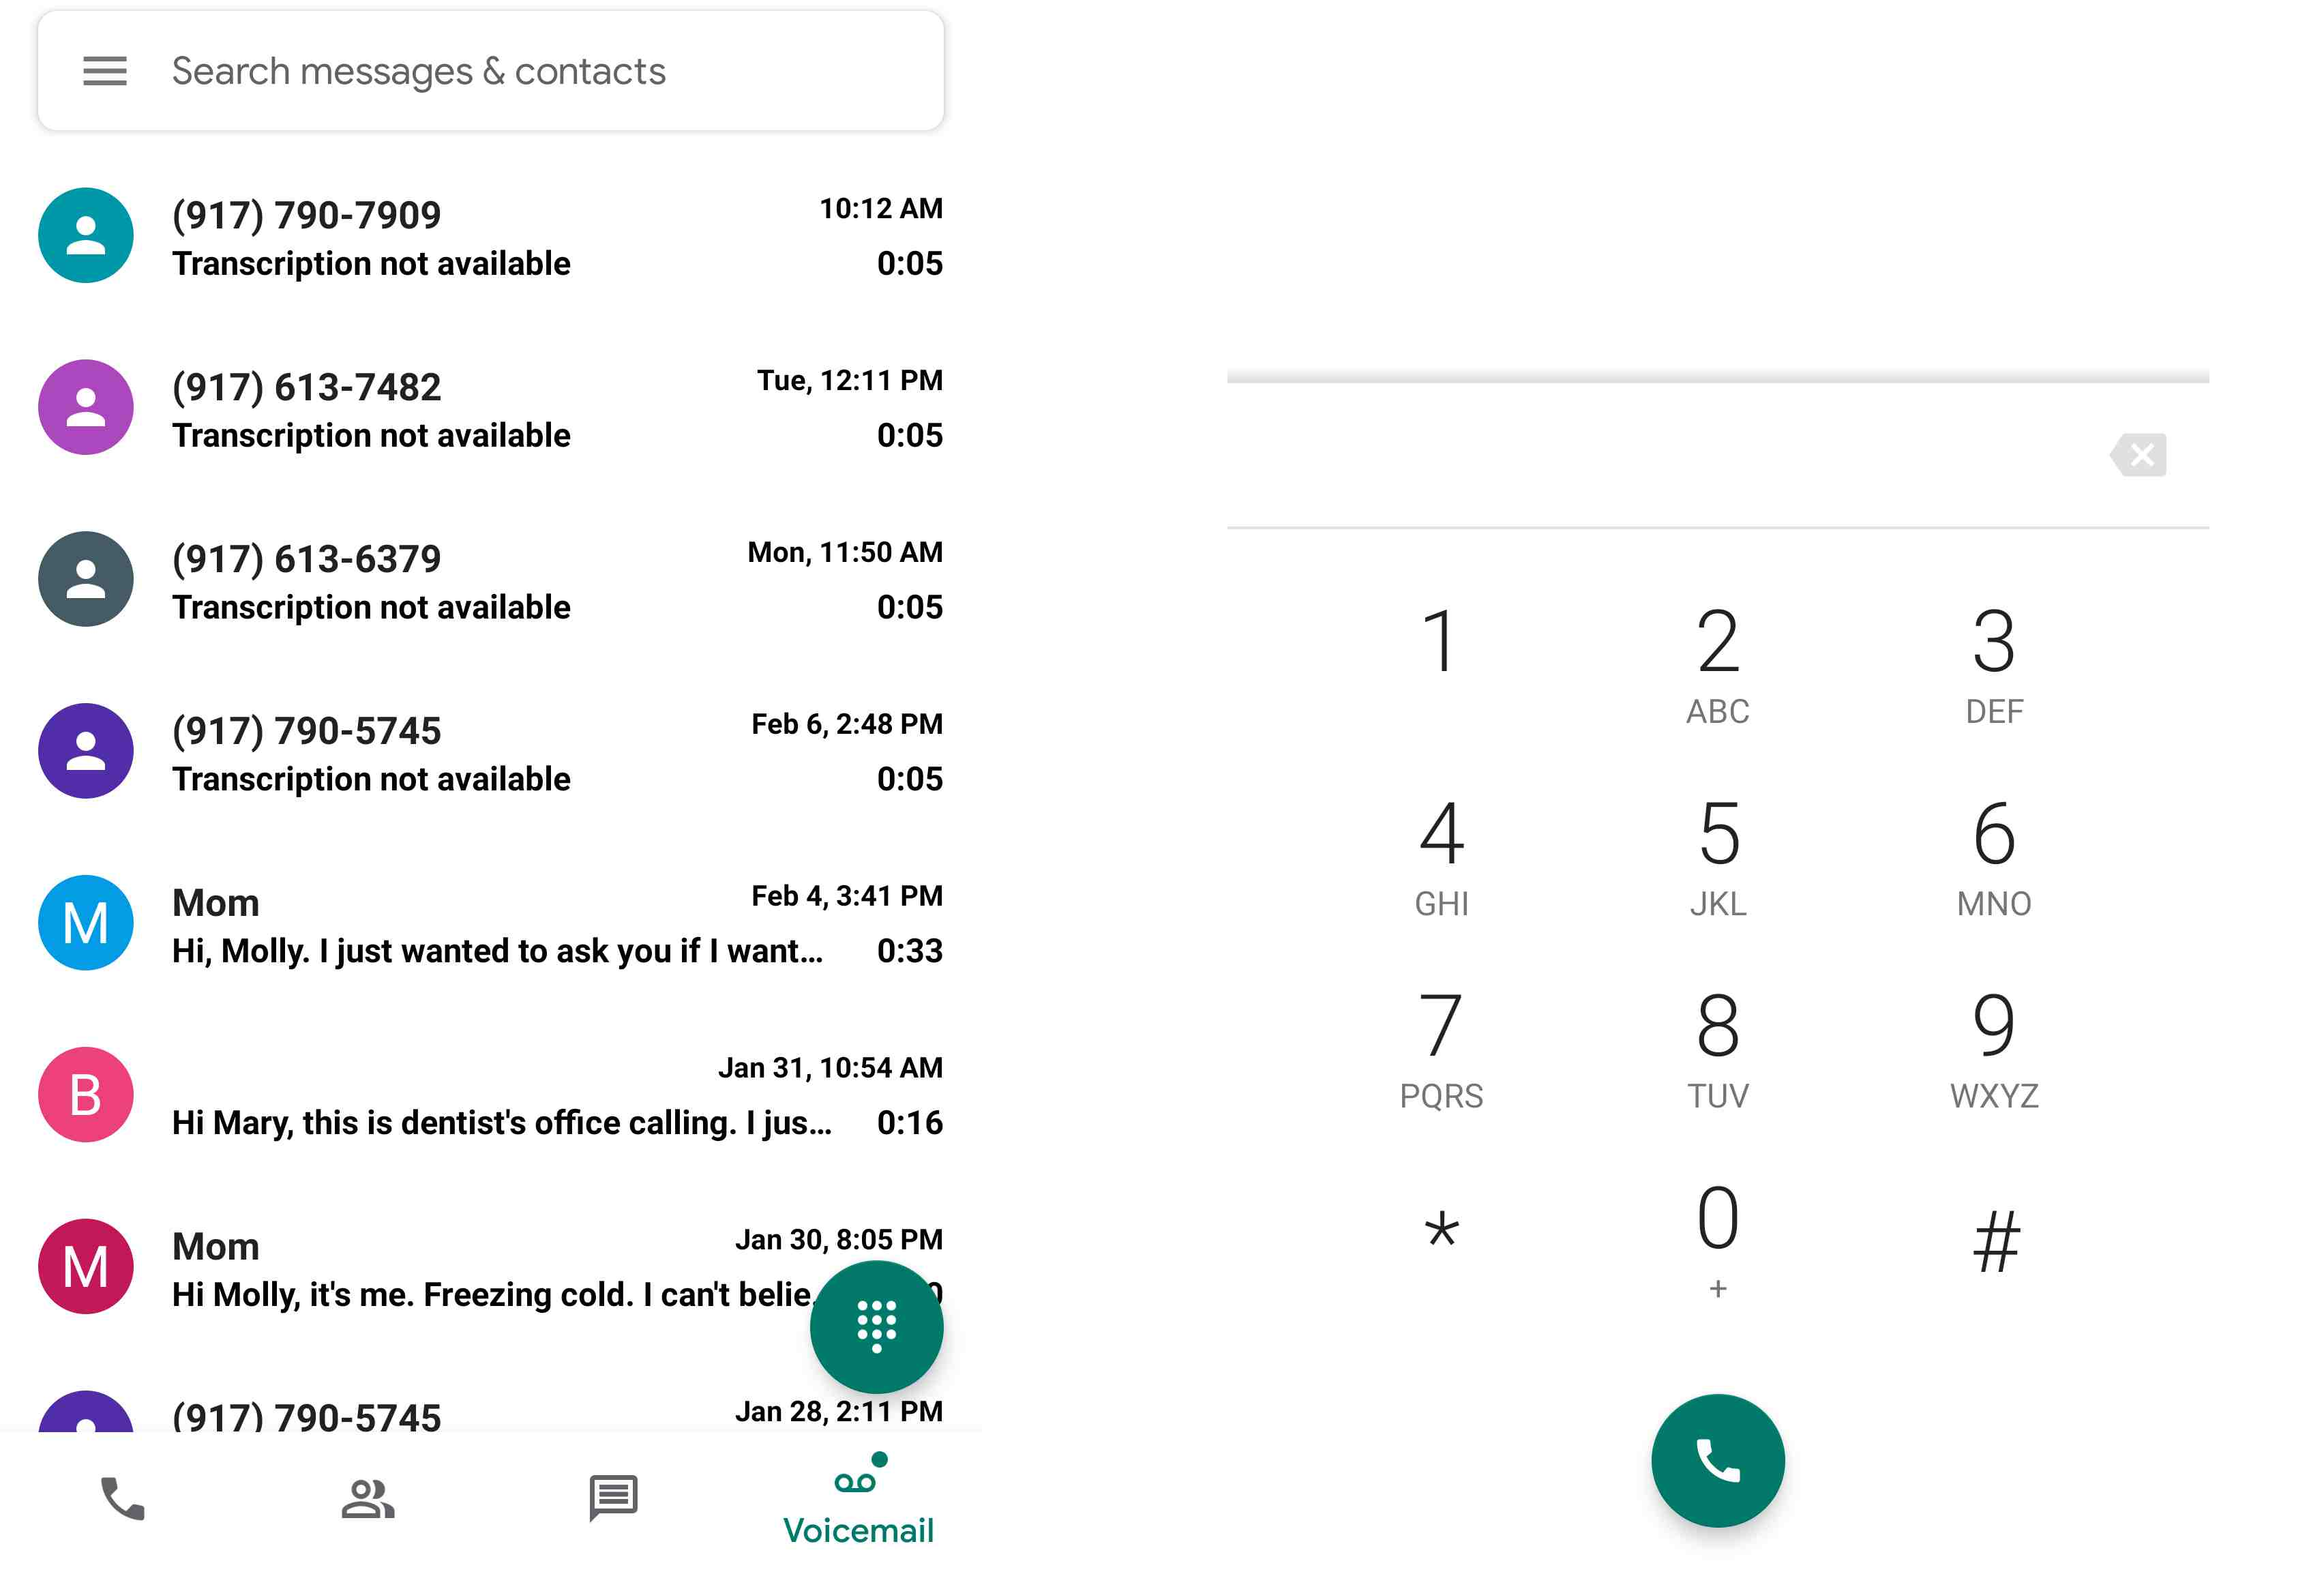 Google Voice app message list and dialer